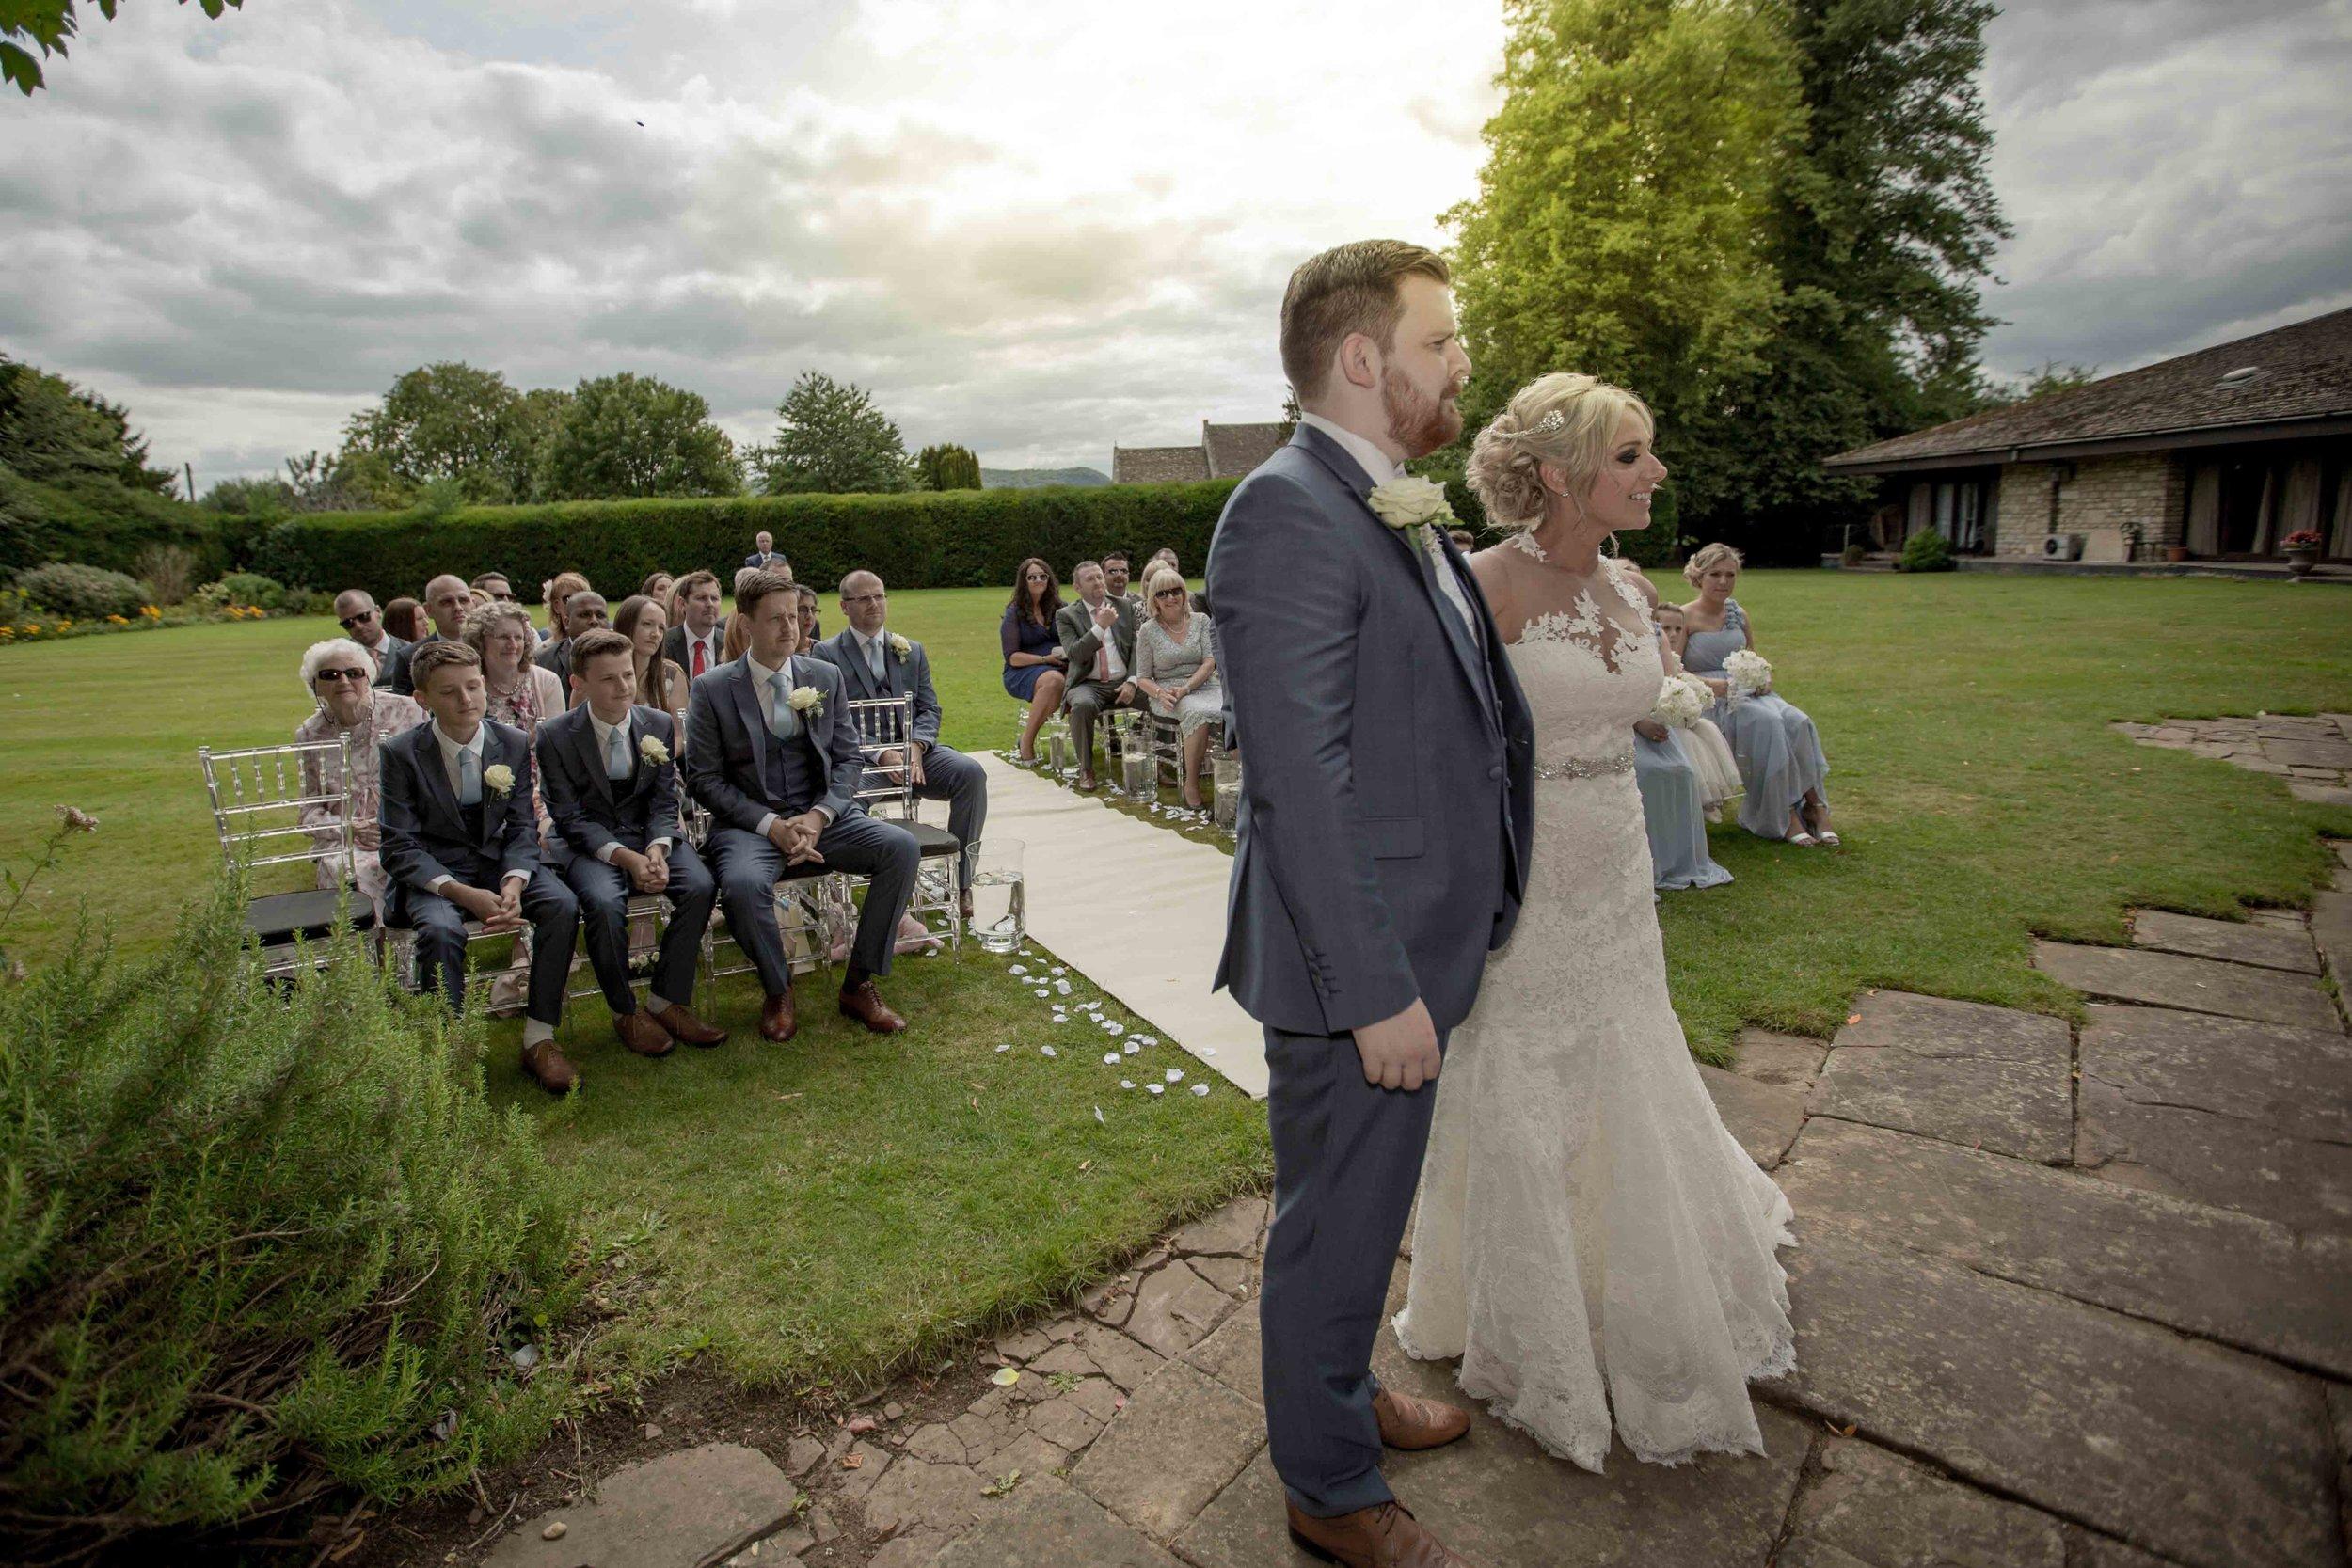 cotswold-wedding-photography-at-stonehouse-court-hotel-natalia-smith-photography-gloucestershire-wedding-photographer-44.jpg